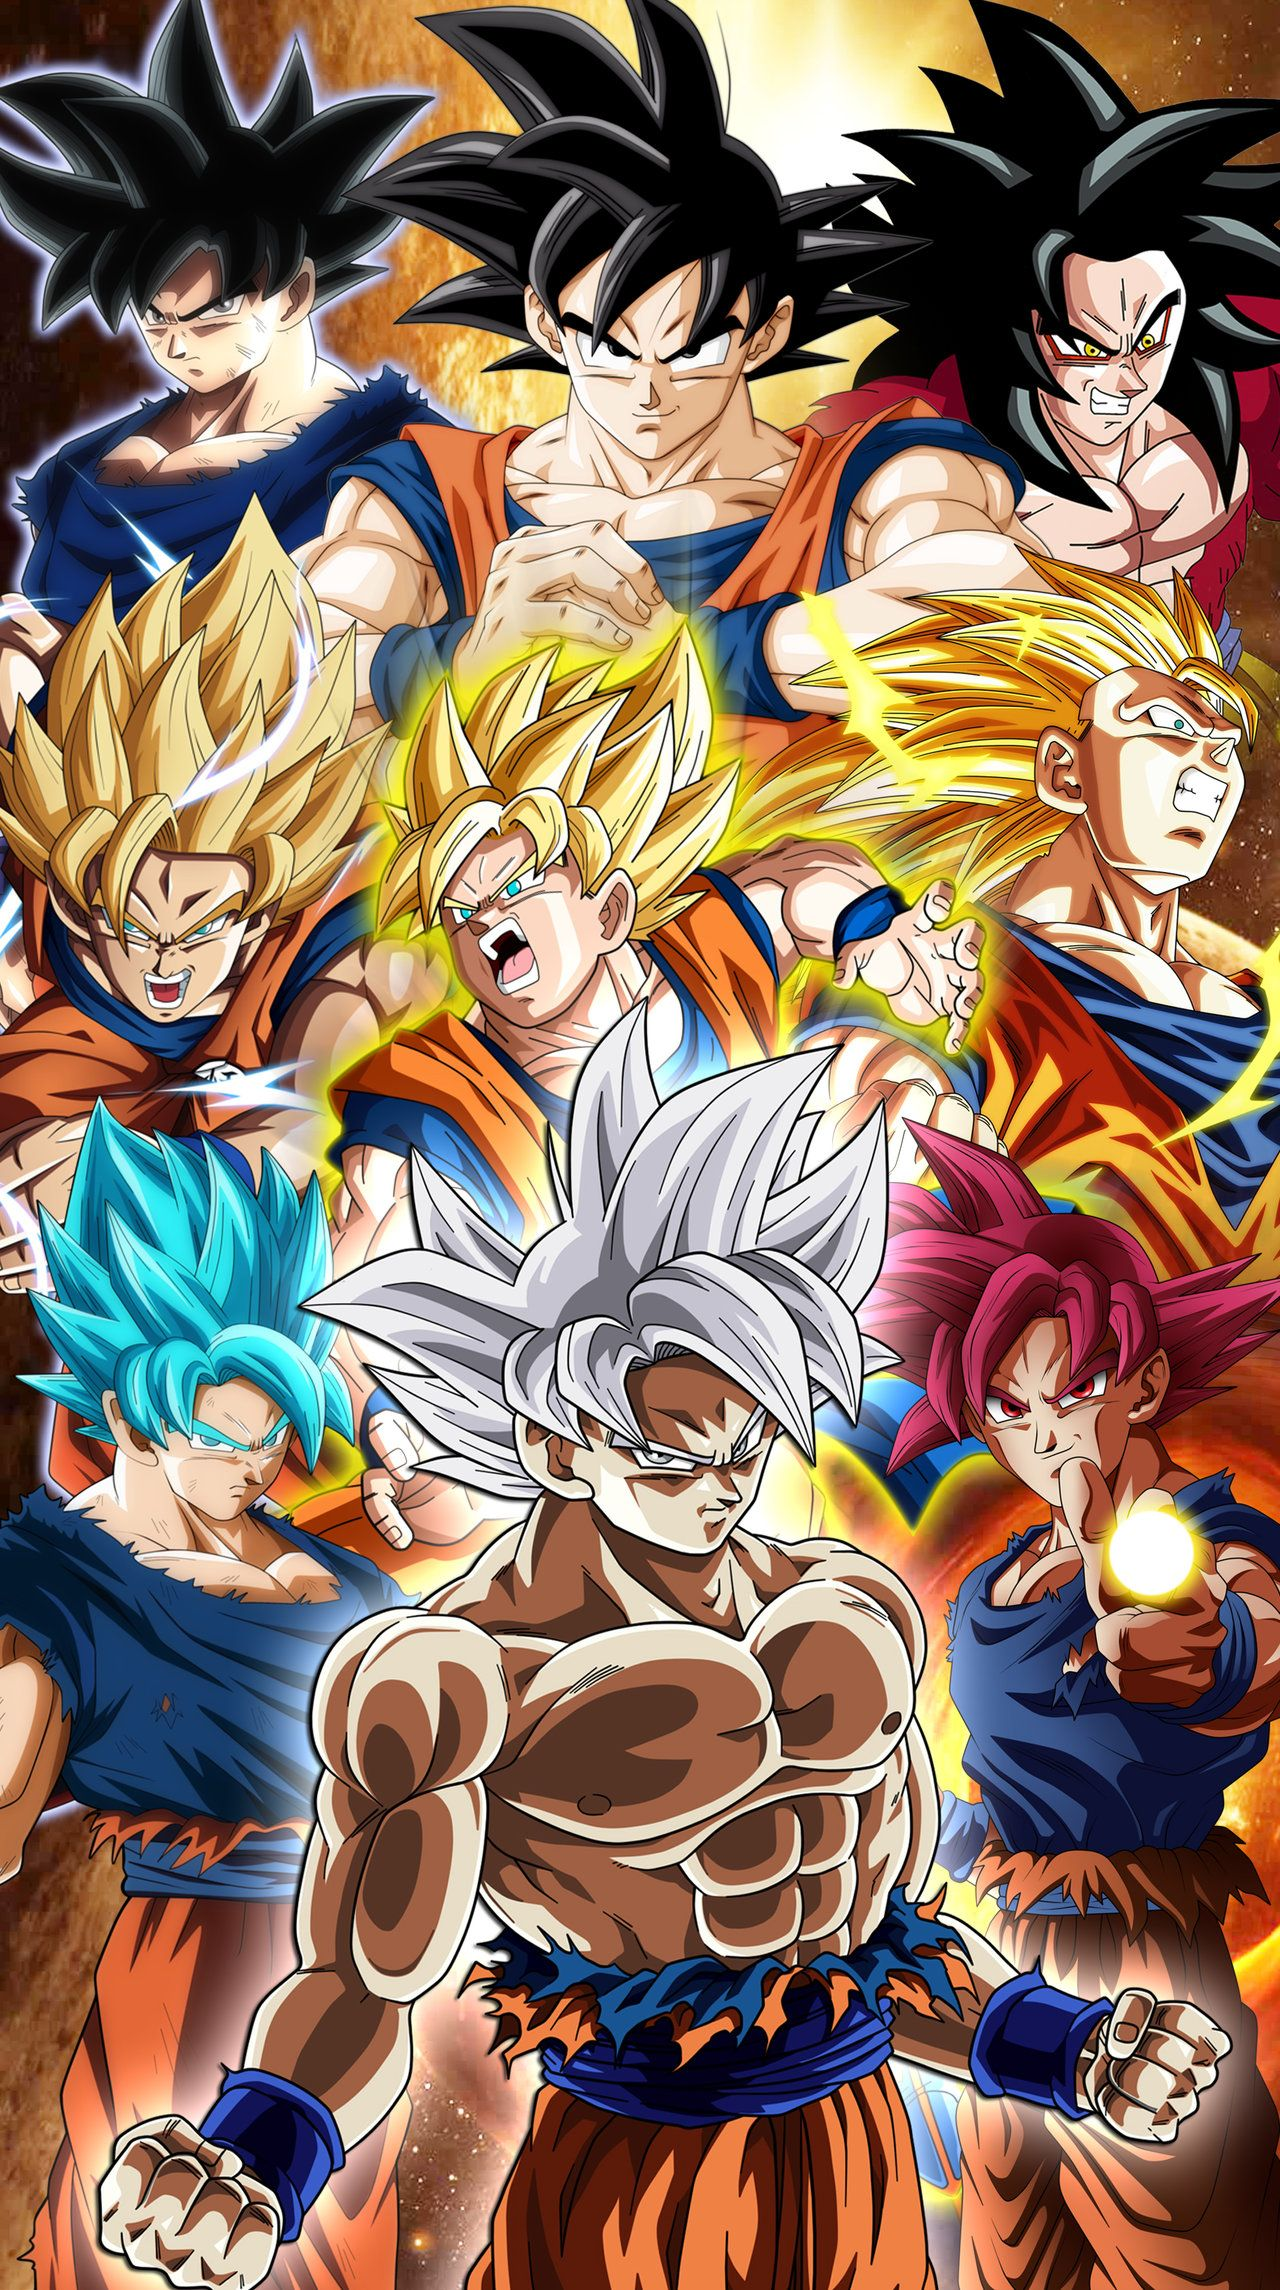 All Goku Transformations Fondo De Pantalla Anime Dragon Ball Super Dragon Ball Super Manga Dragon Ball Image